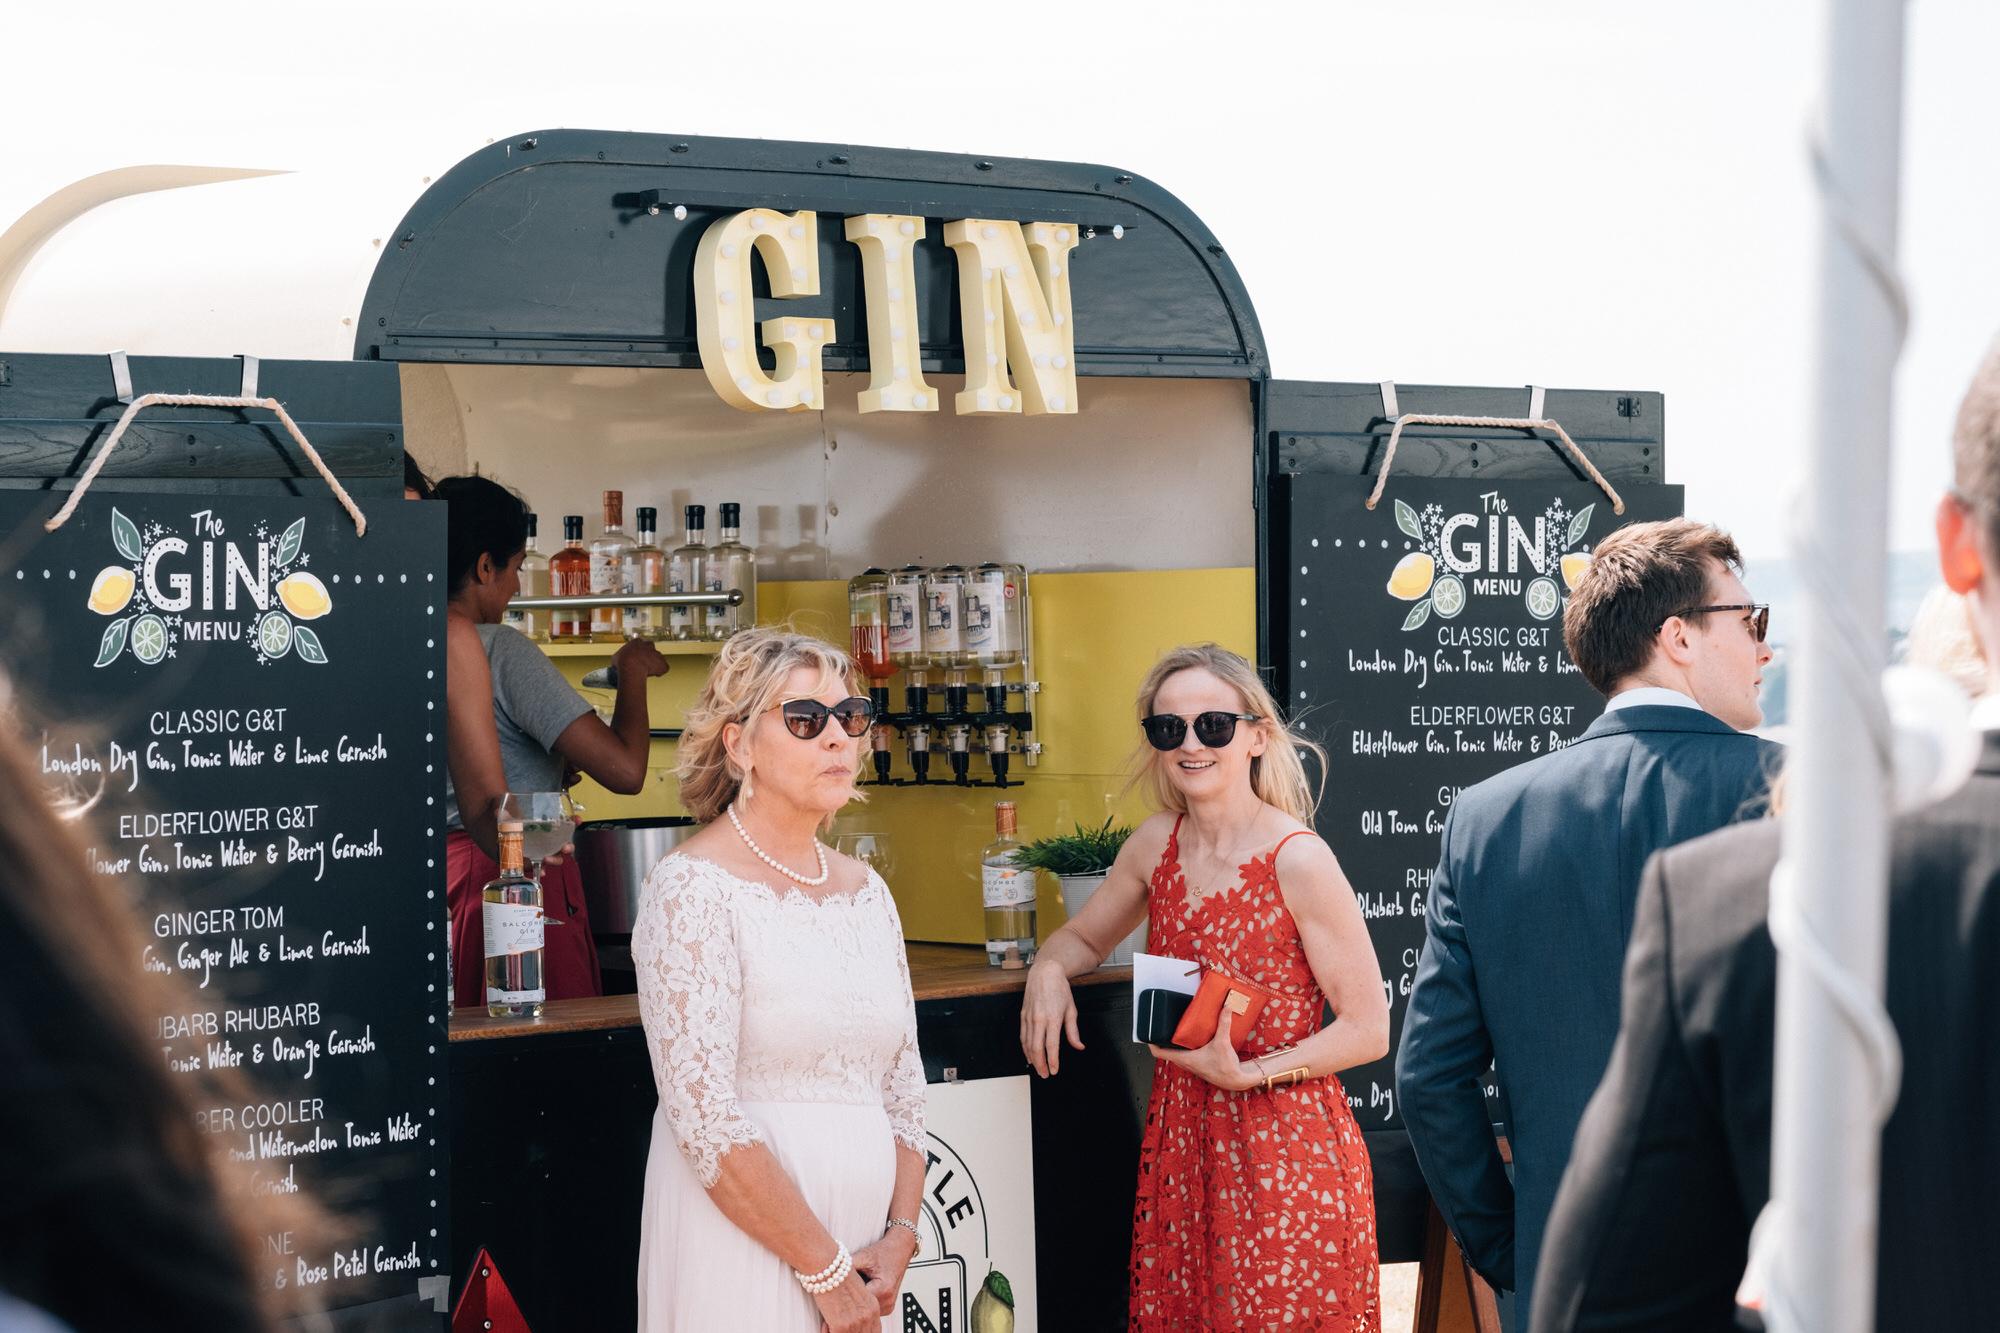 8e28bc2d0e1 ... WEdding gin bar - A Floral Charlotte Balbier Gown for a Summer Wedding  in Sunny Devon